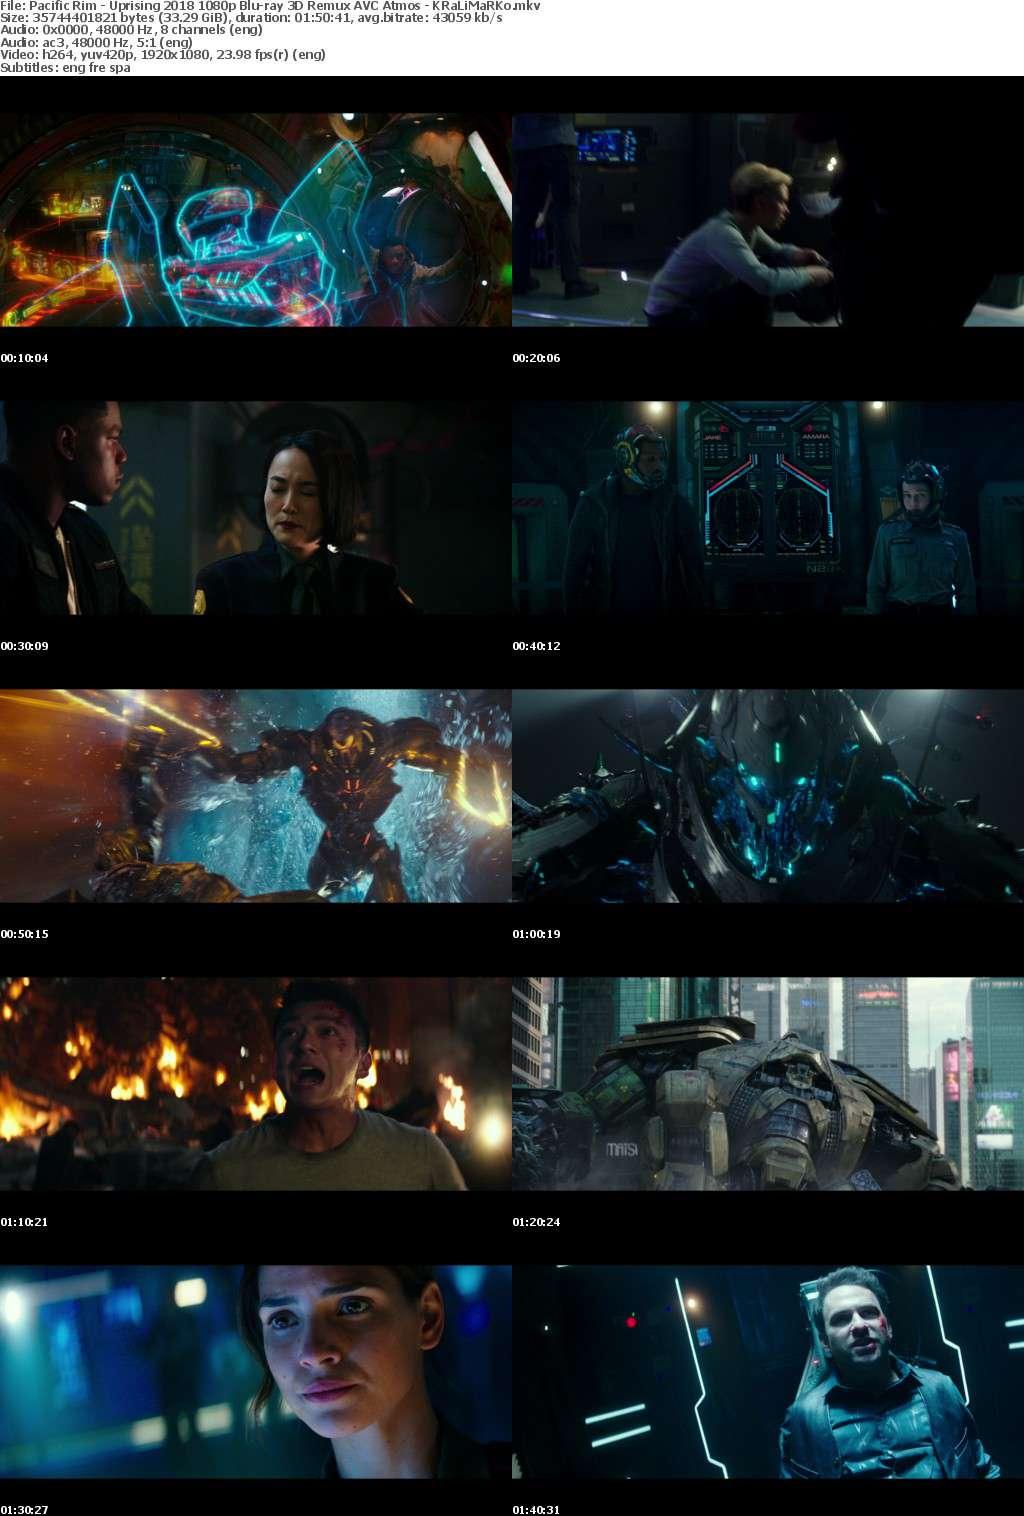 Pacific Rim Uprising 2018 1080p Blu-ray 3D Remux AVC Atmos - KRaLiMaRKo